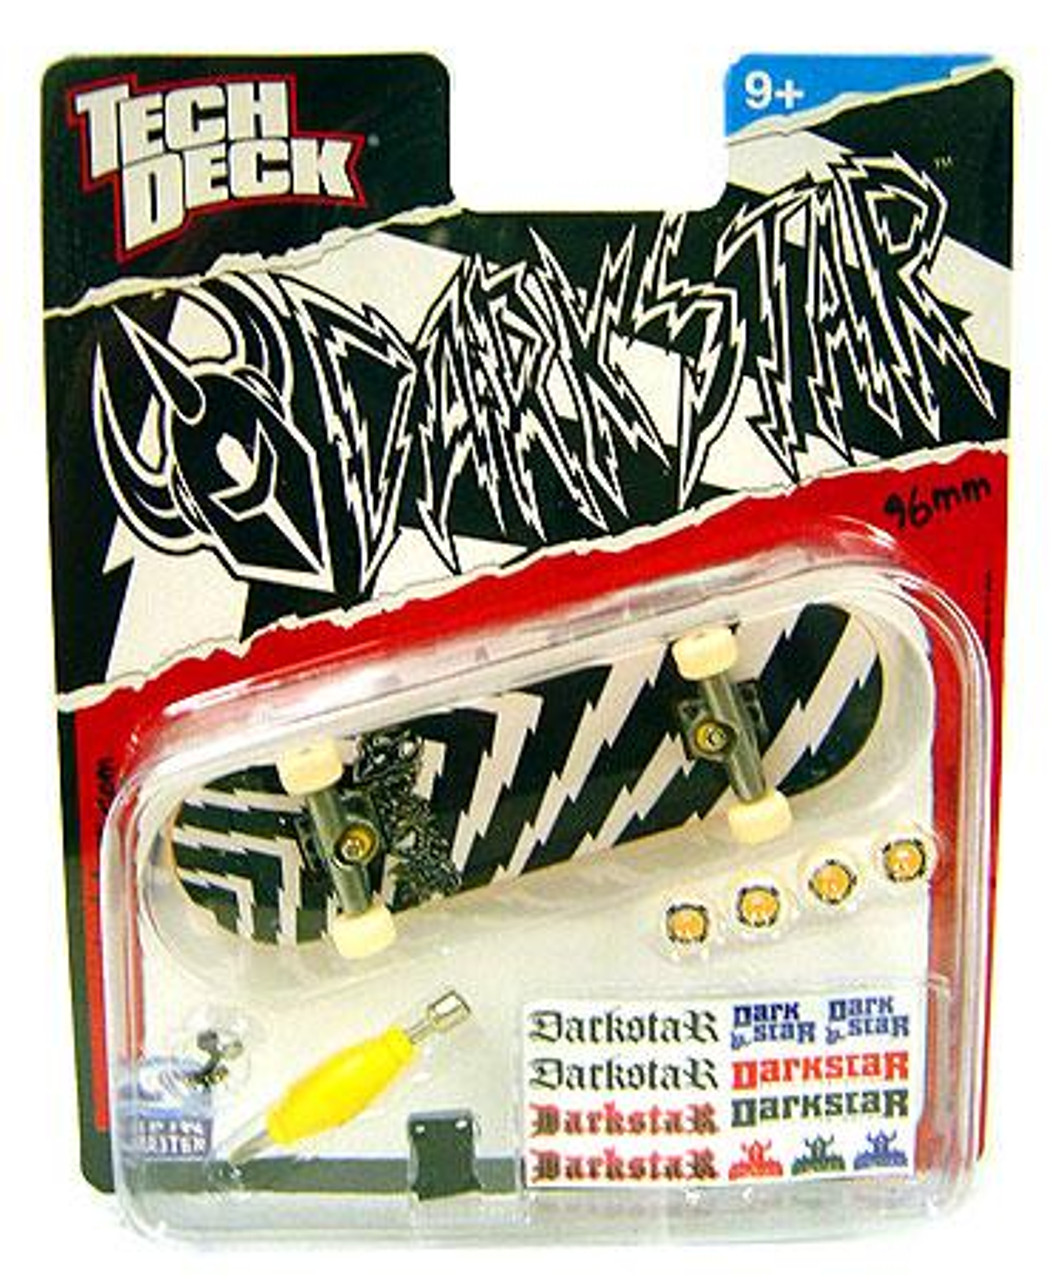 Tech Deck Darkstar 96mm Mini Skateboard [Black & White Zig-Zag]